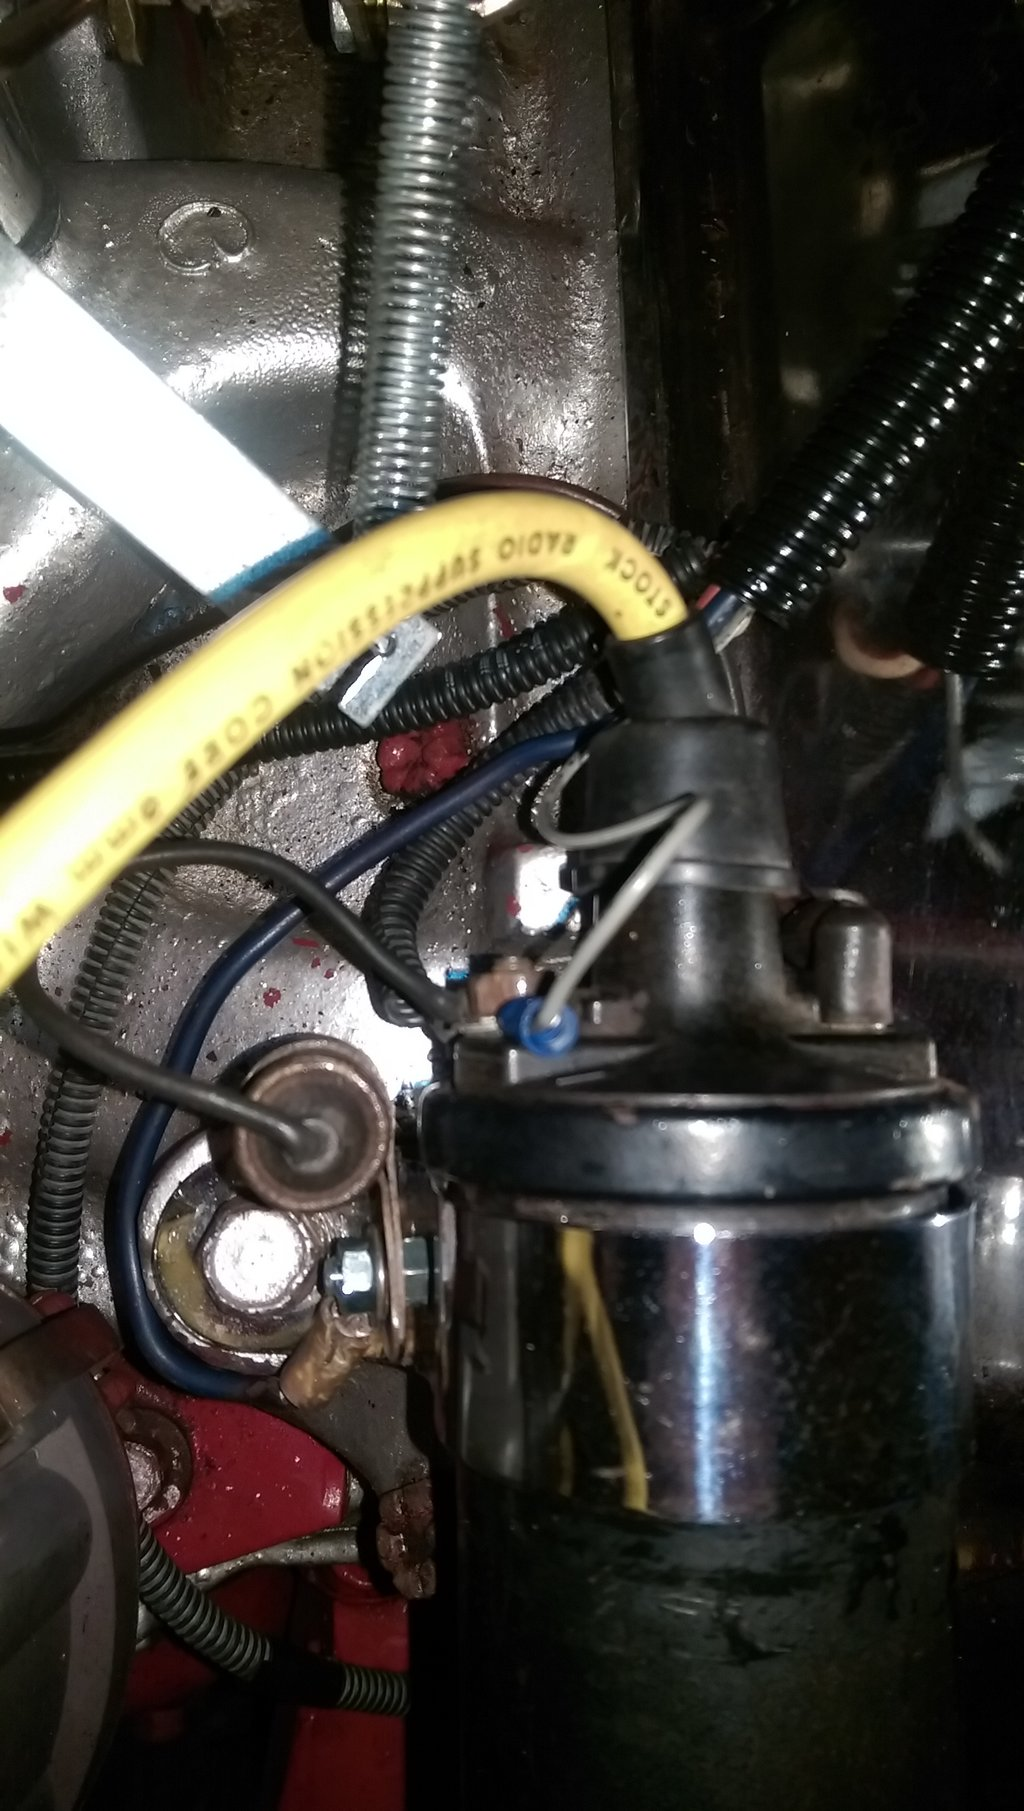 Muscle Car Motor Hot Rod Amerika Big Block Oldtimer V8 Auto